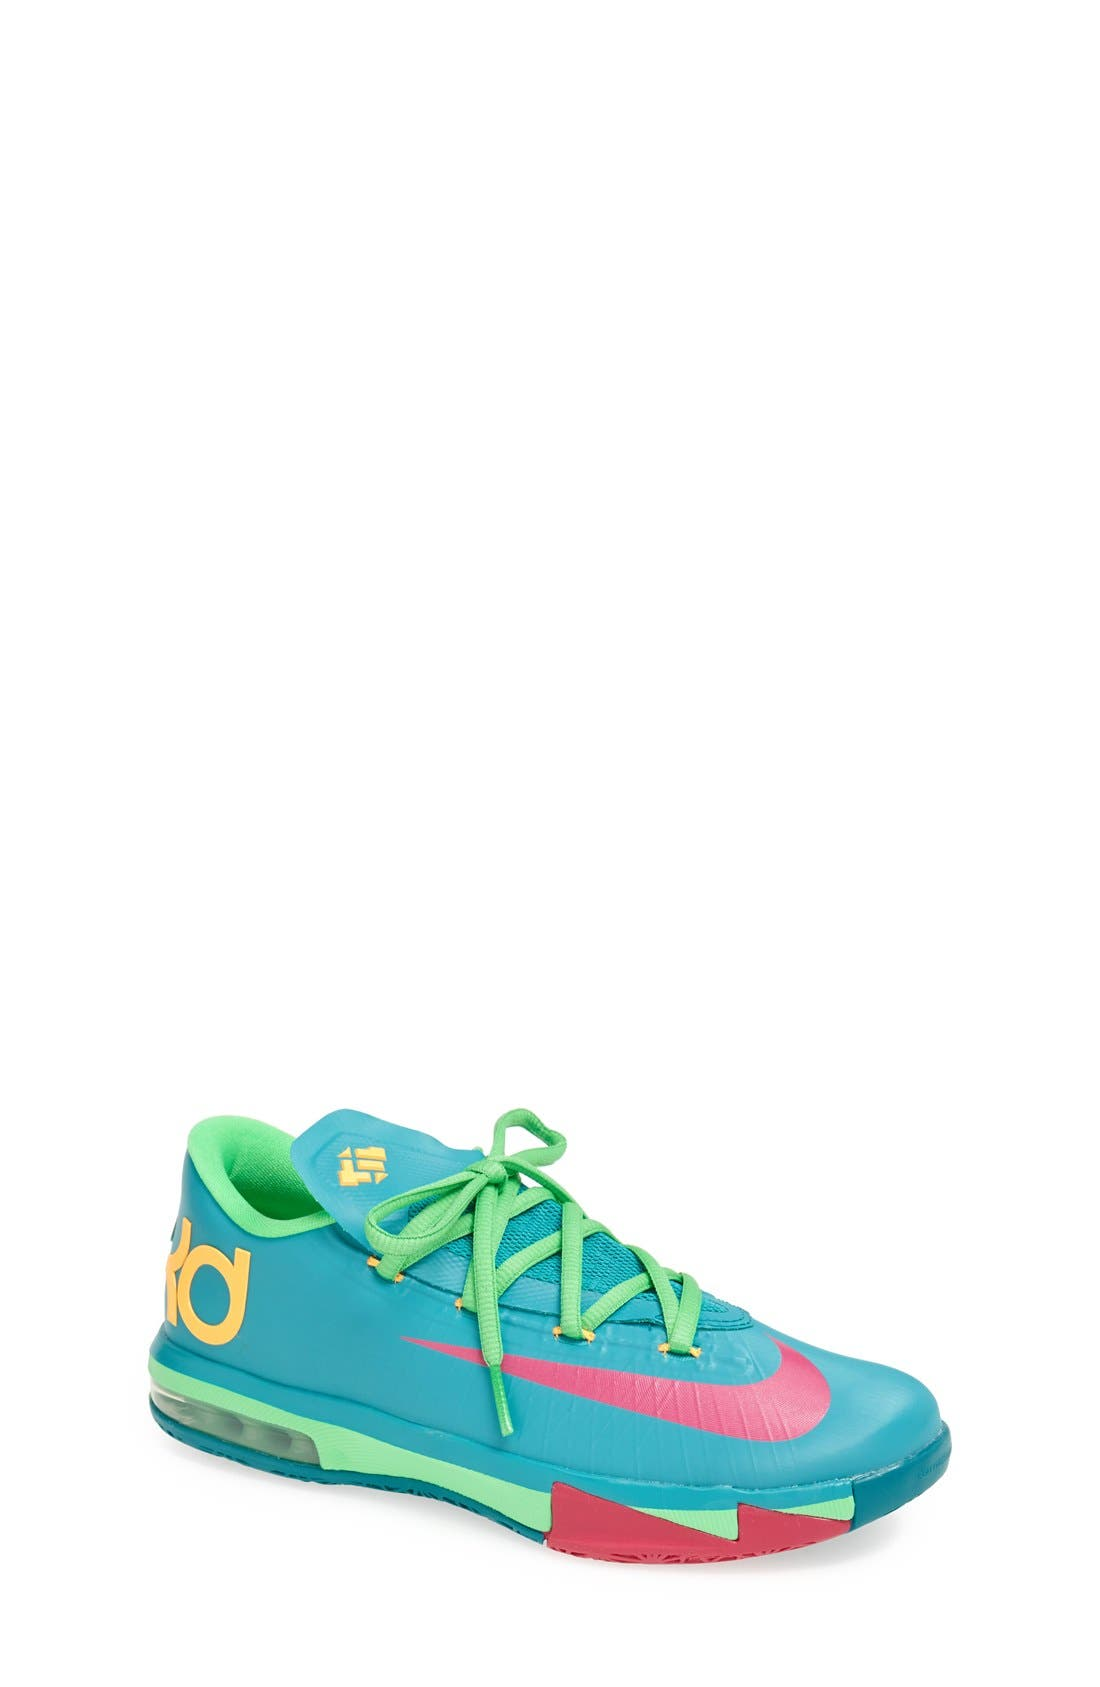 Main Image - Nike 'KD VI' Basketball Shoe (Big Kid)